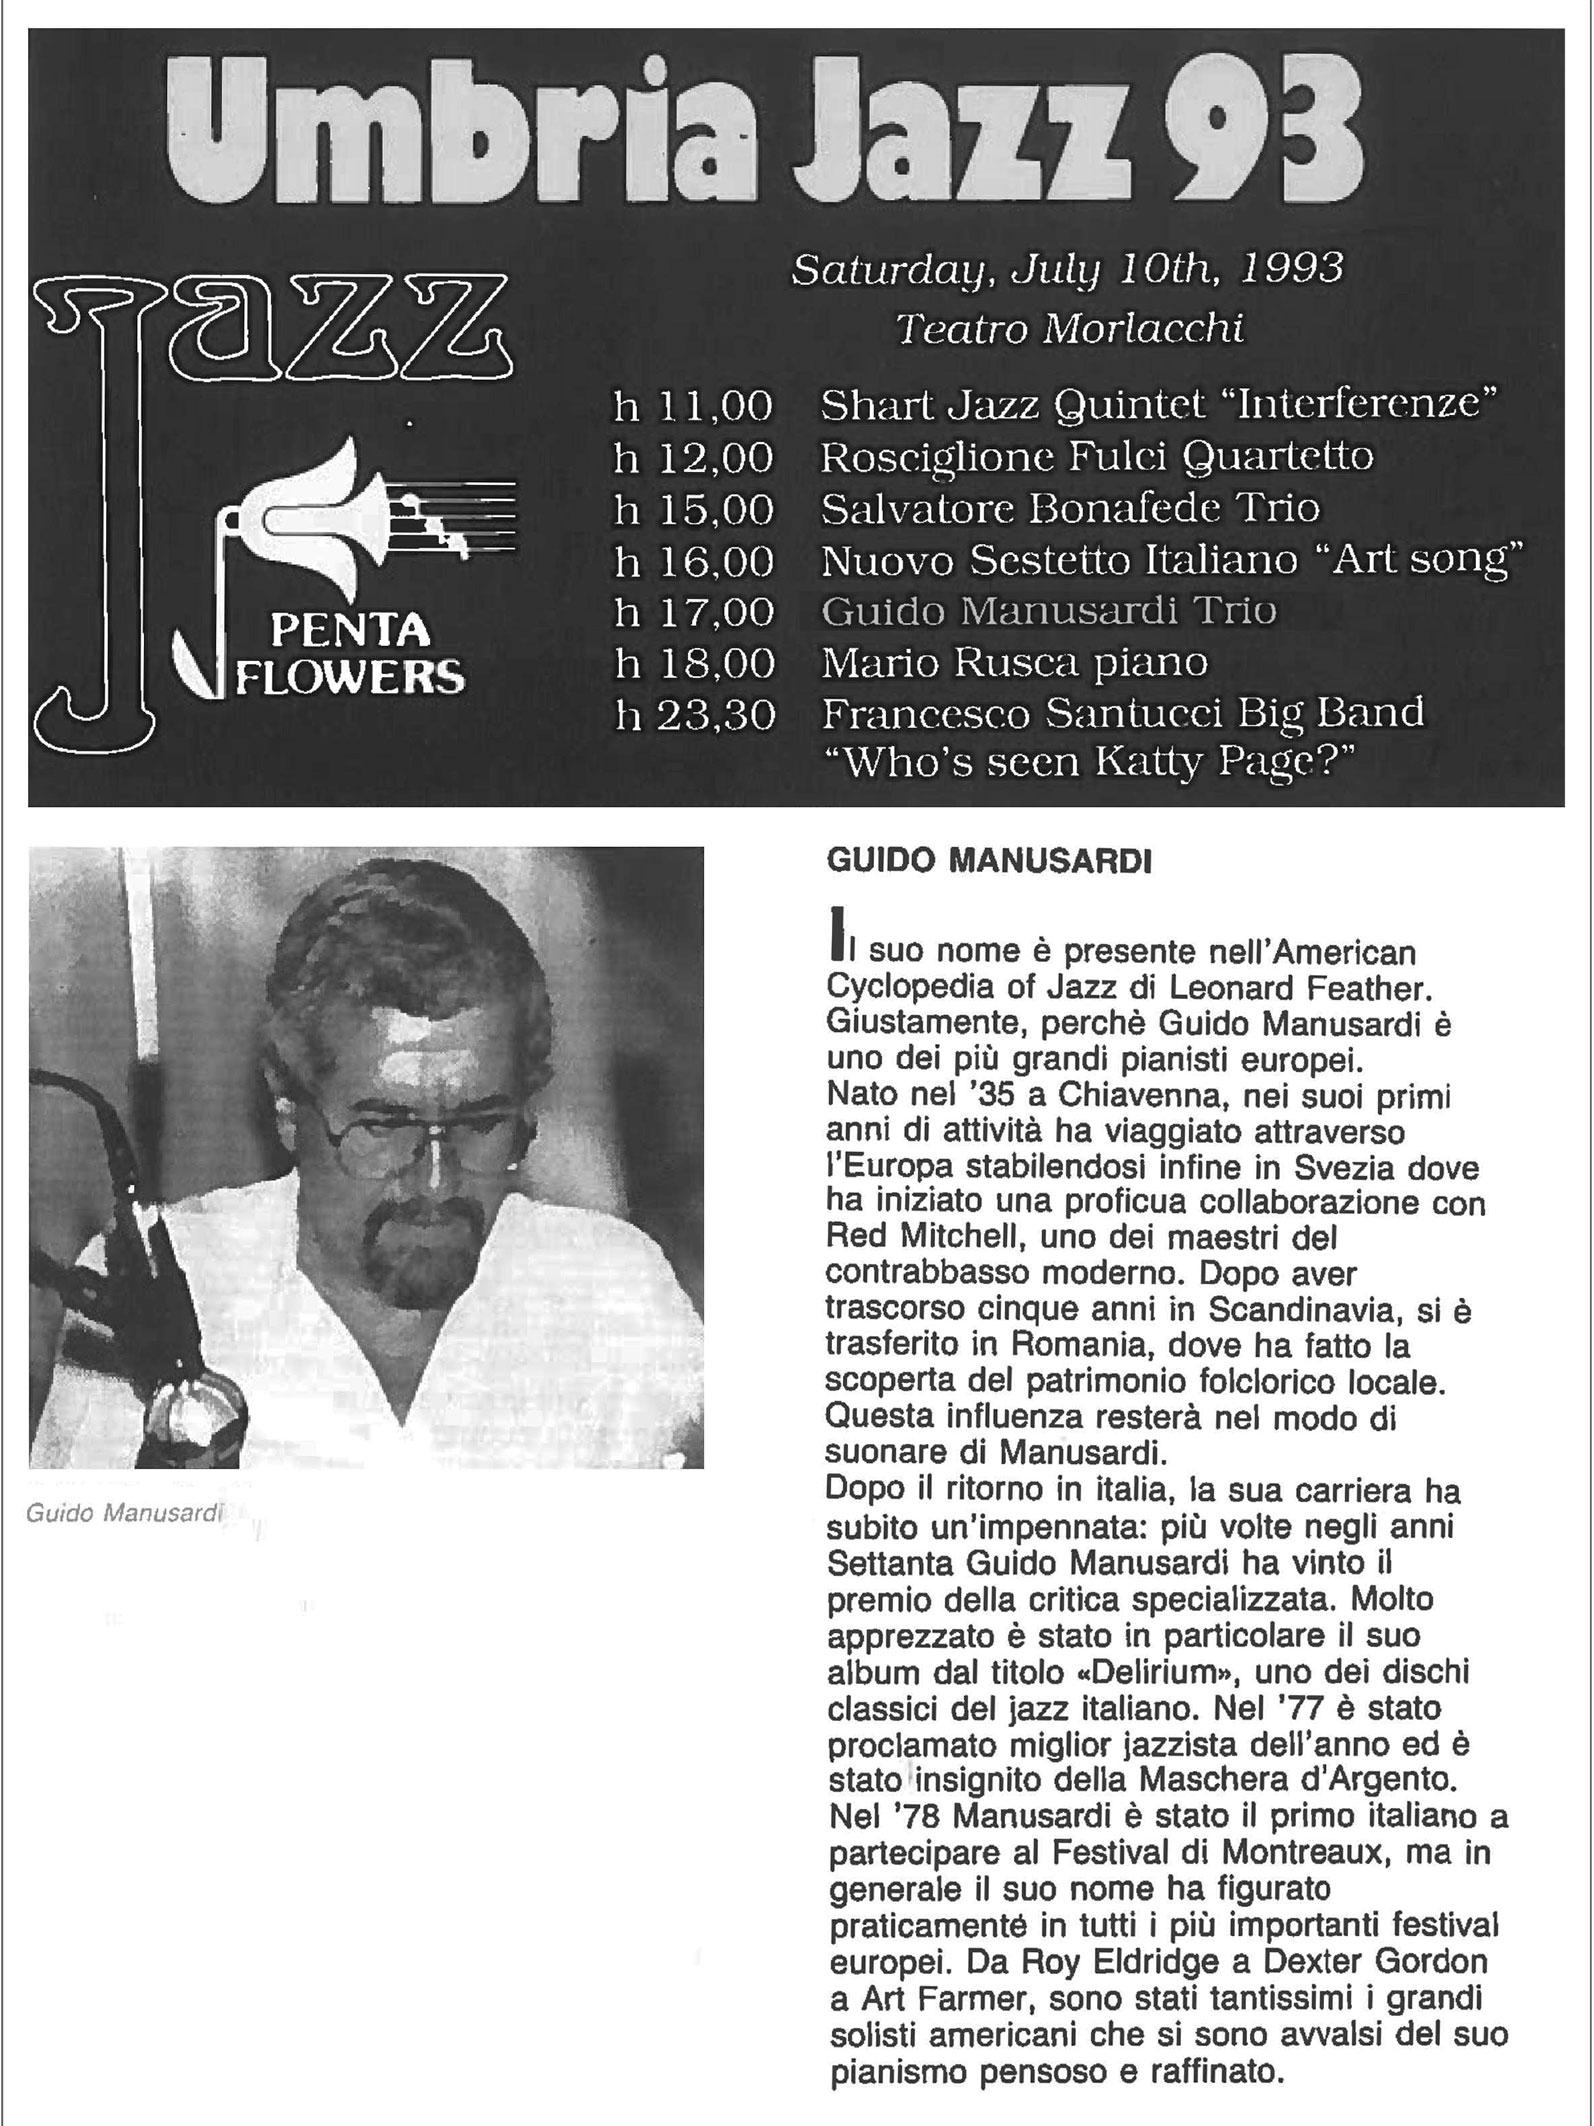 UMBRIA JAZZ 1993